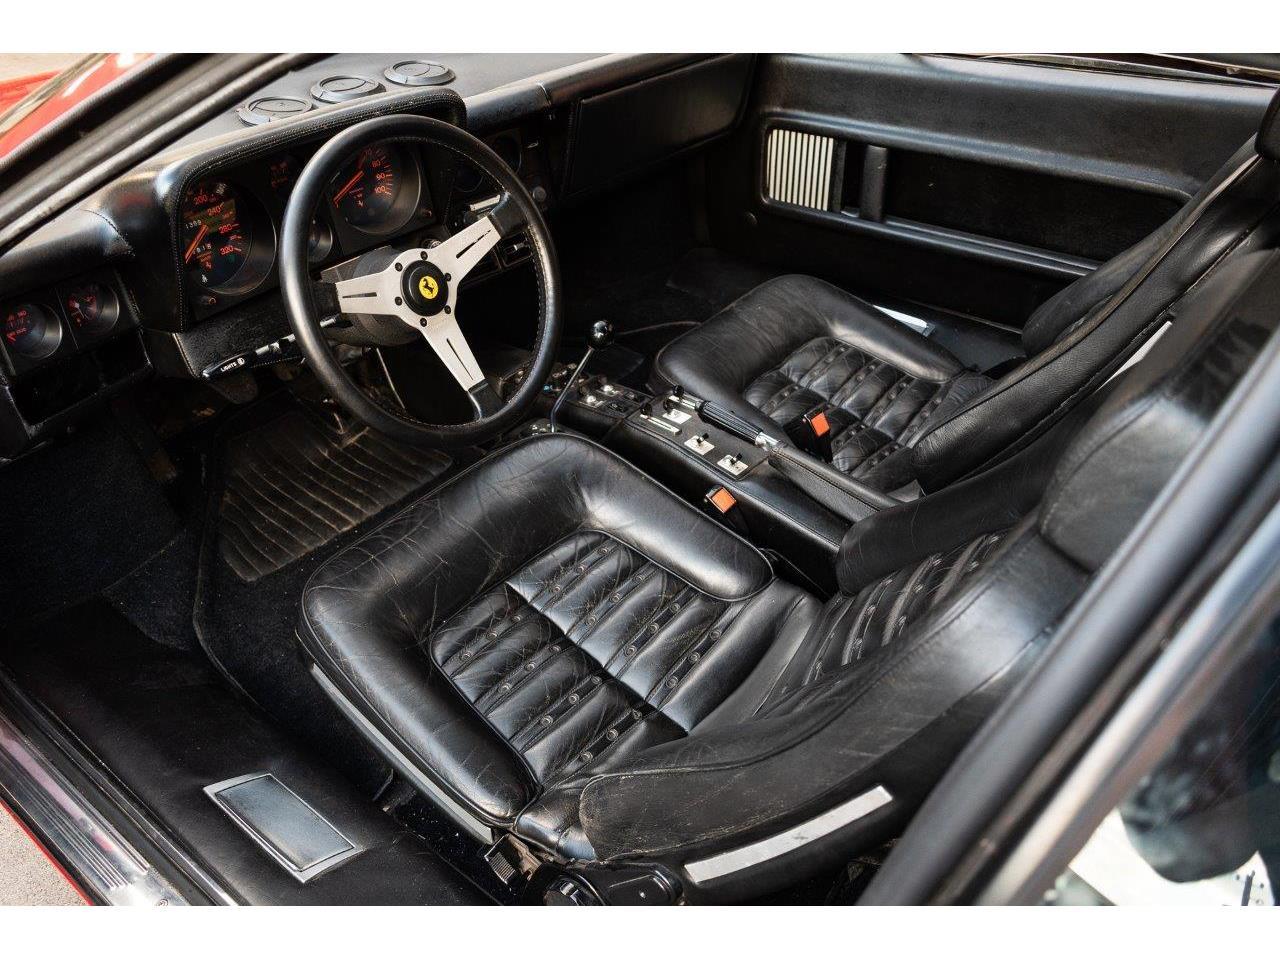 1981 Ferrari 512 BBI (CC-1305959) for sale in Astoria, New York